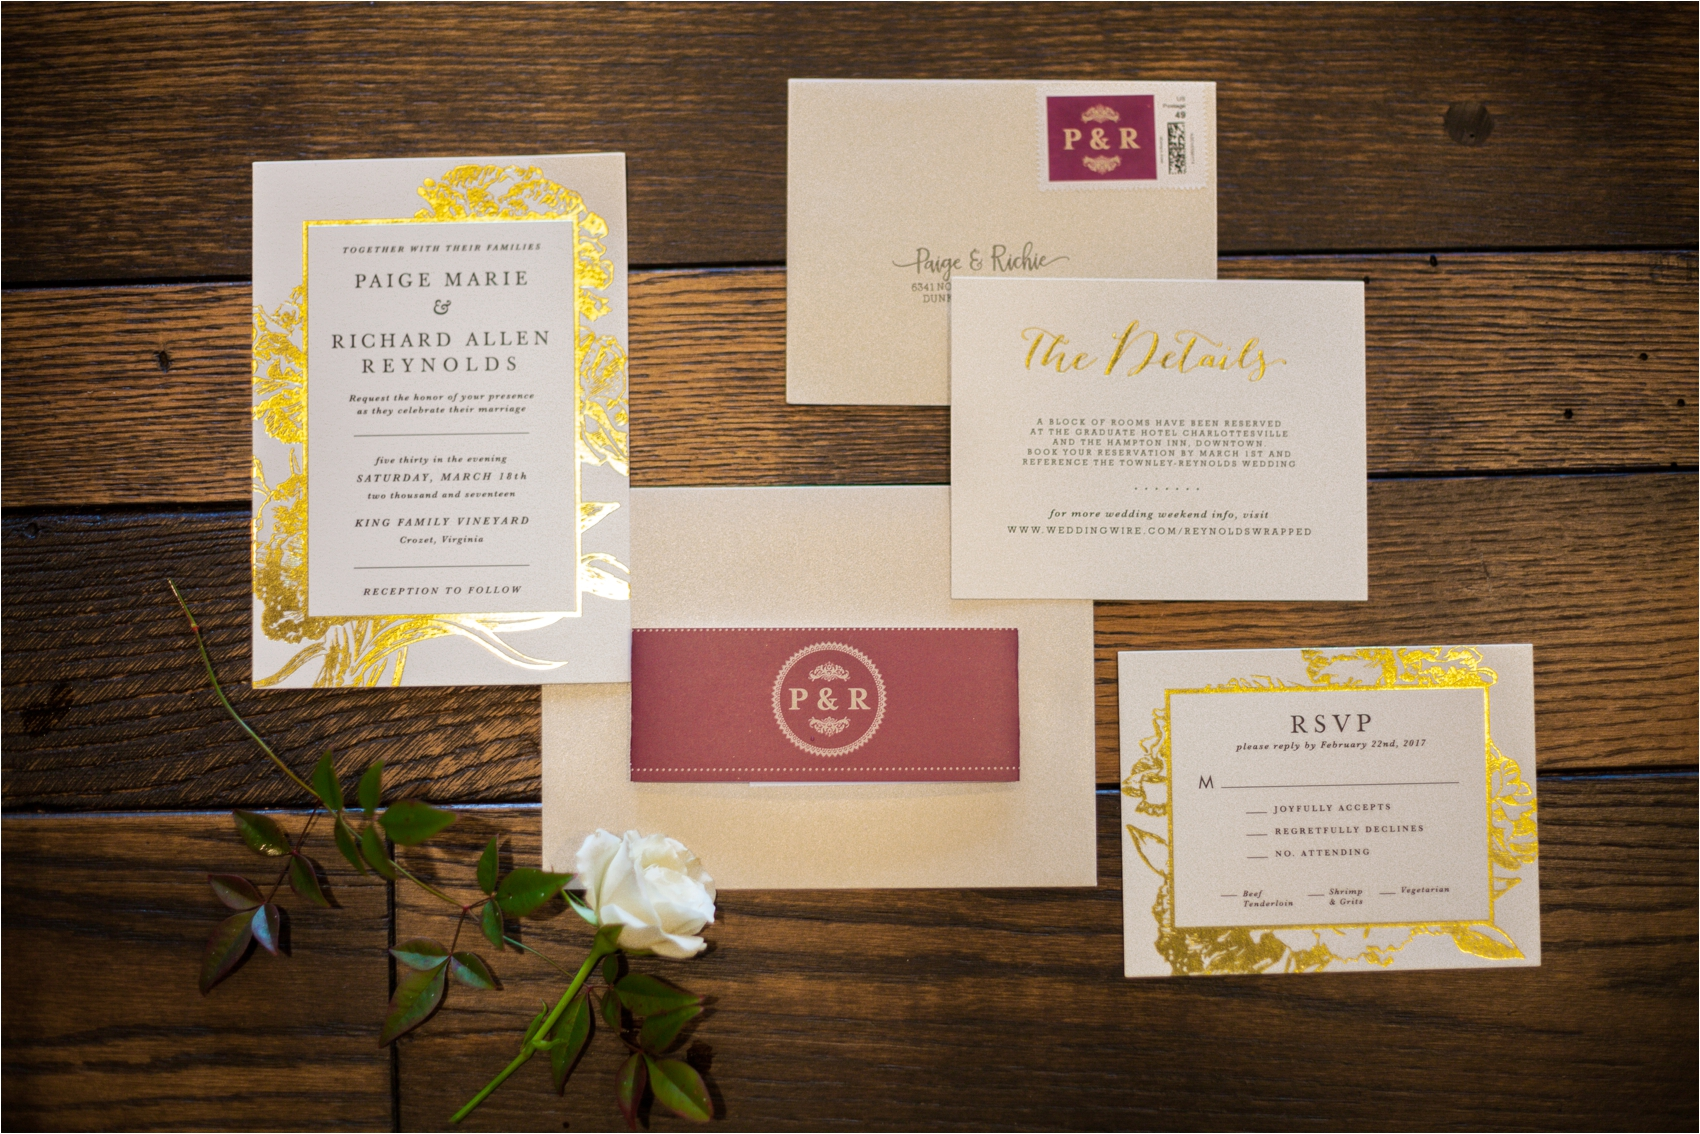 King-Family-Vineyard-Spring-Virginia-Wedding-0991.jpg